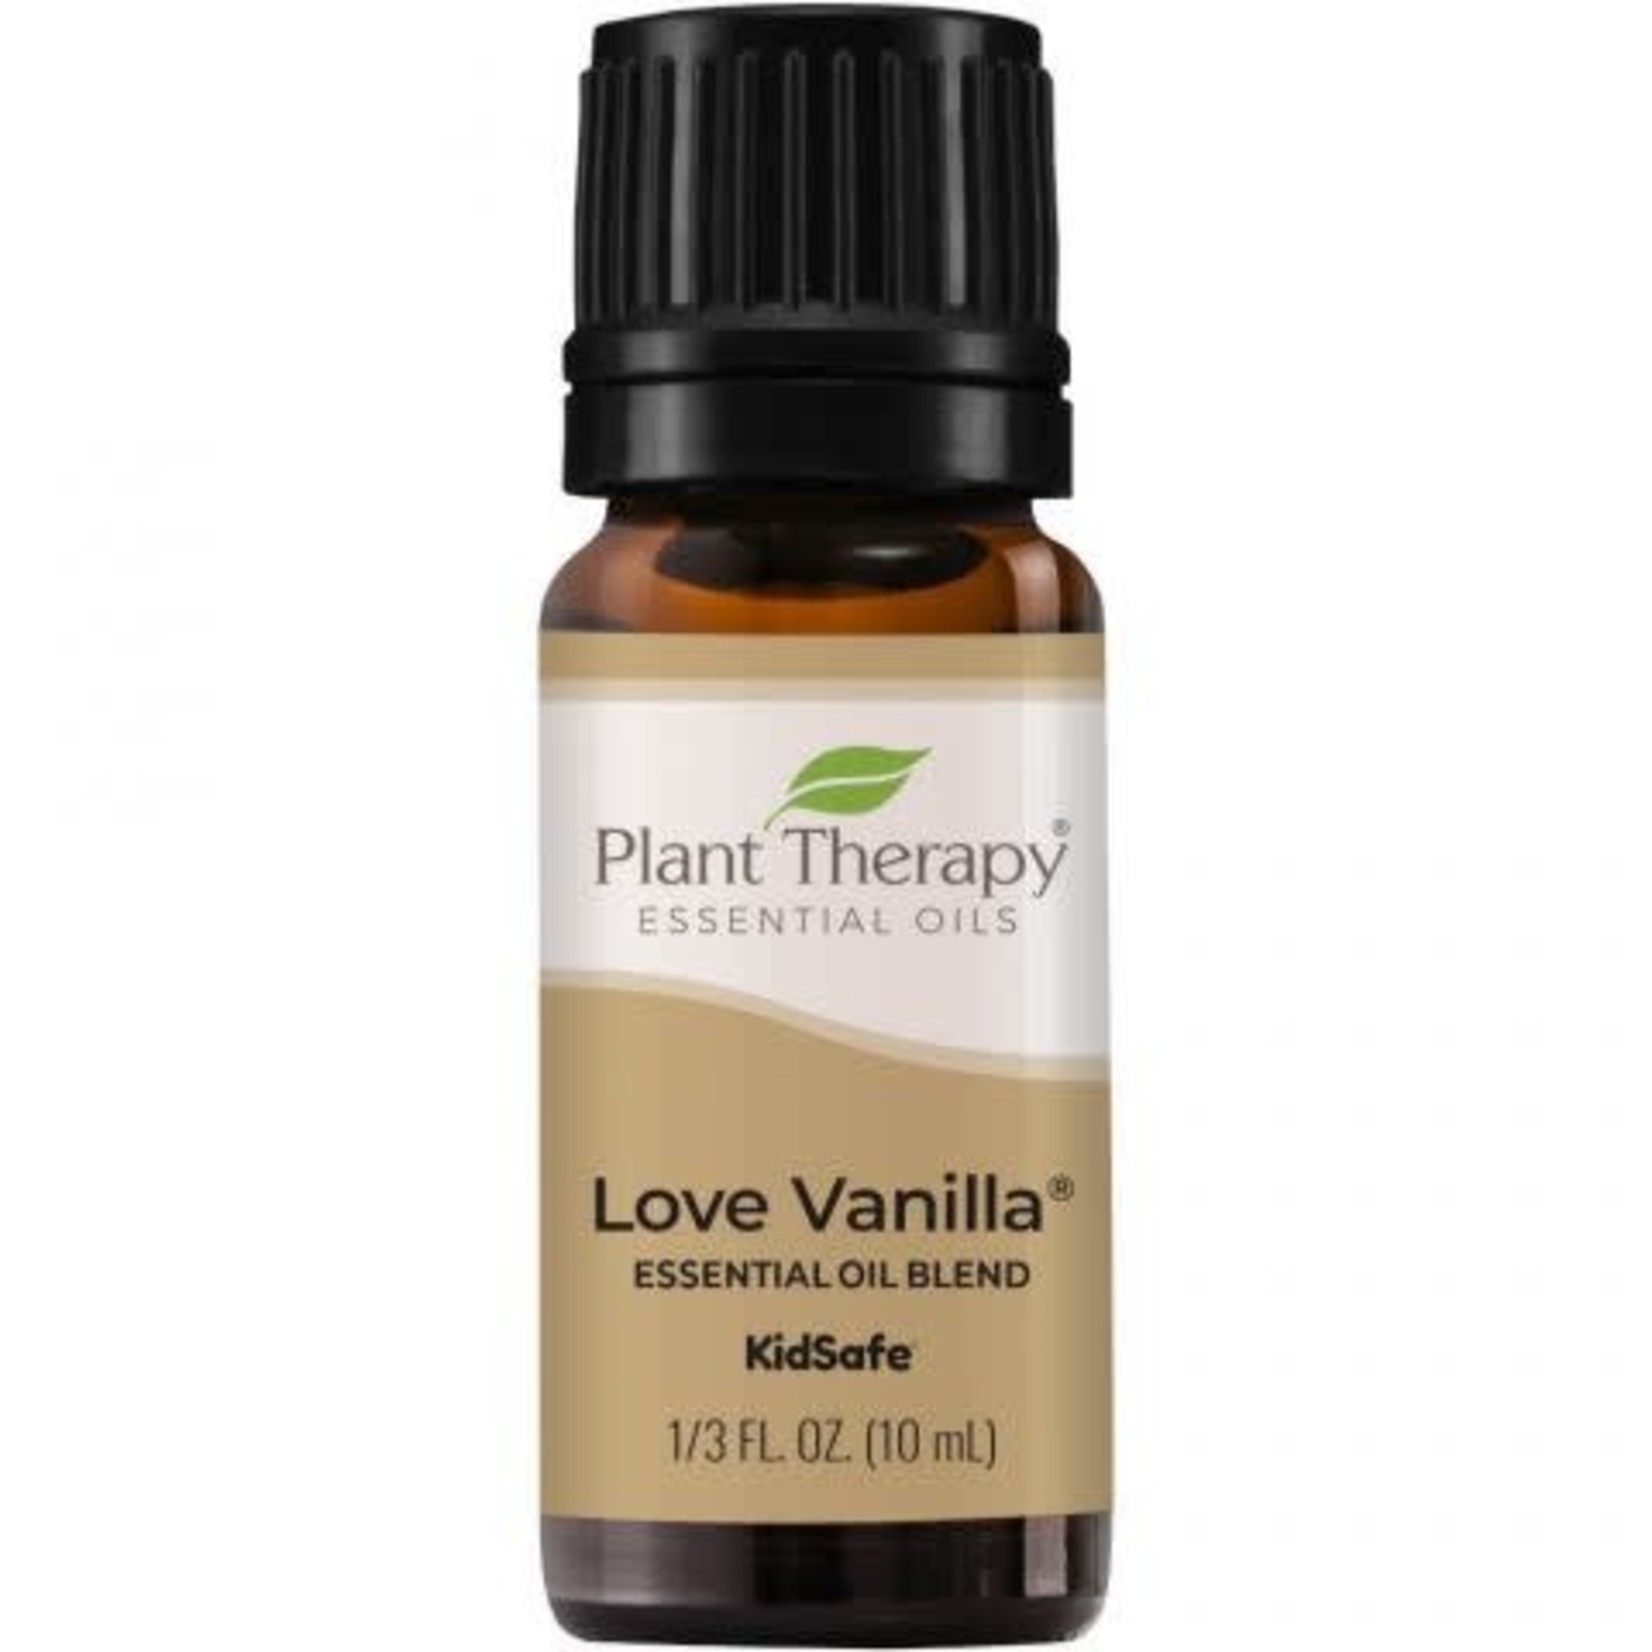 Plant Therapy PT Love Vanilla Essential Oil Blend 10ml